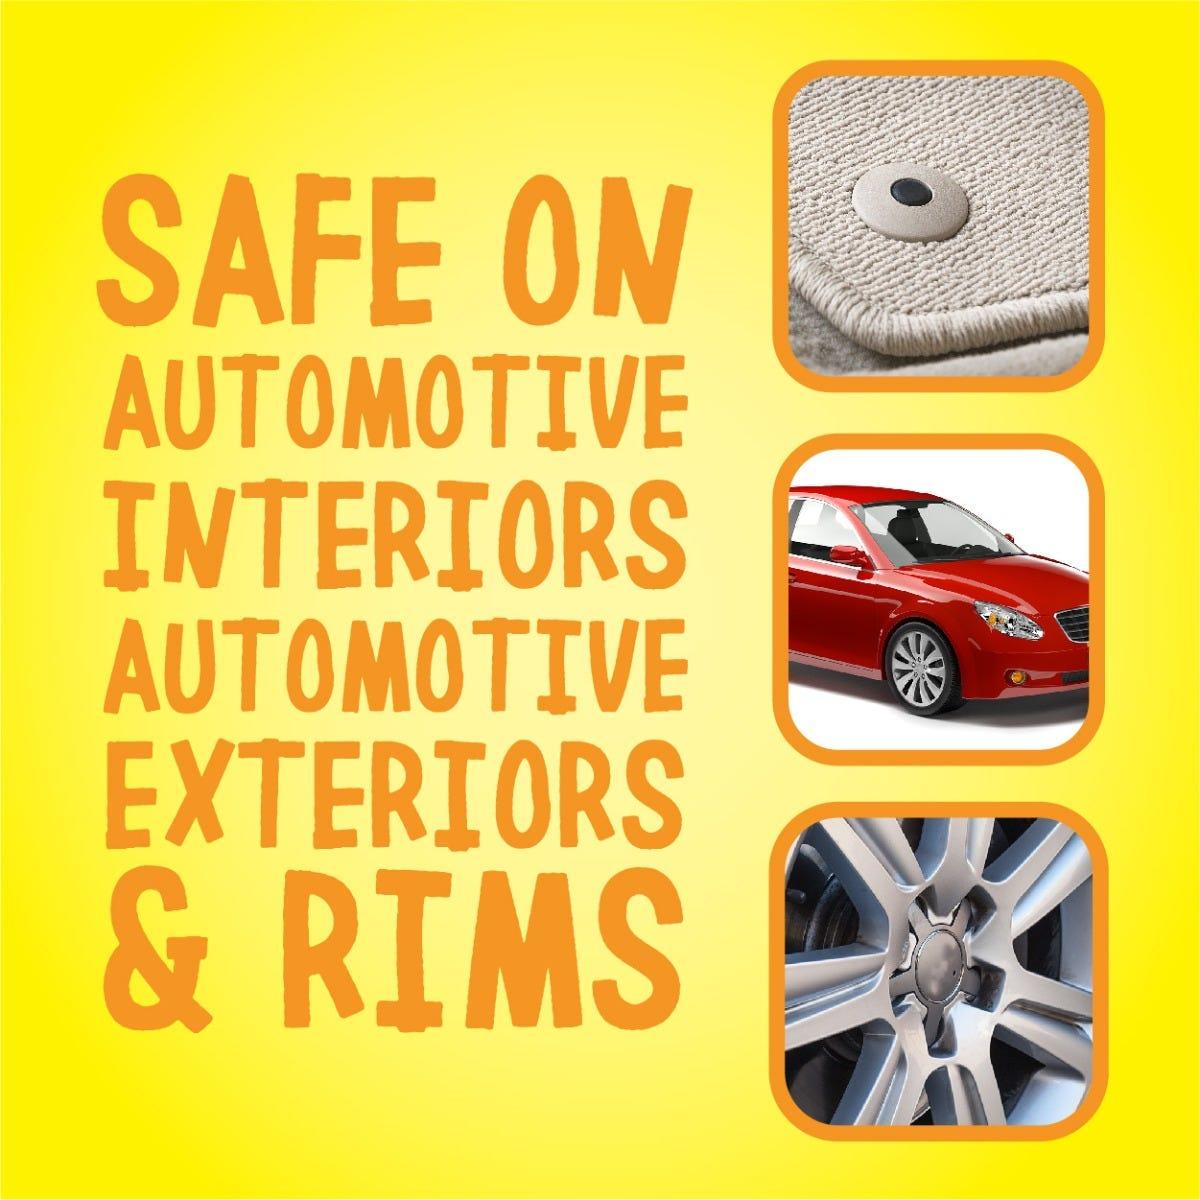 Safe on automotive interiors & exteriors